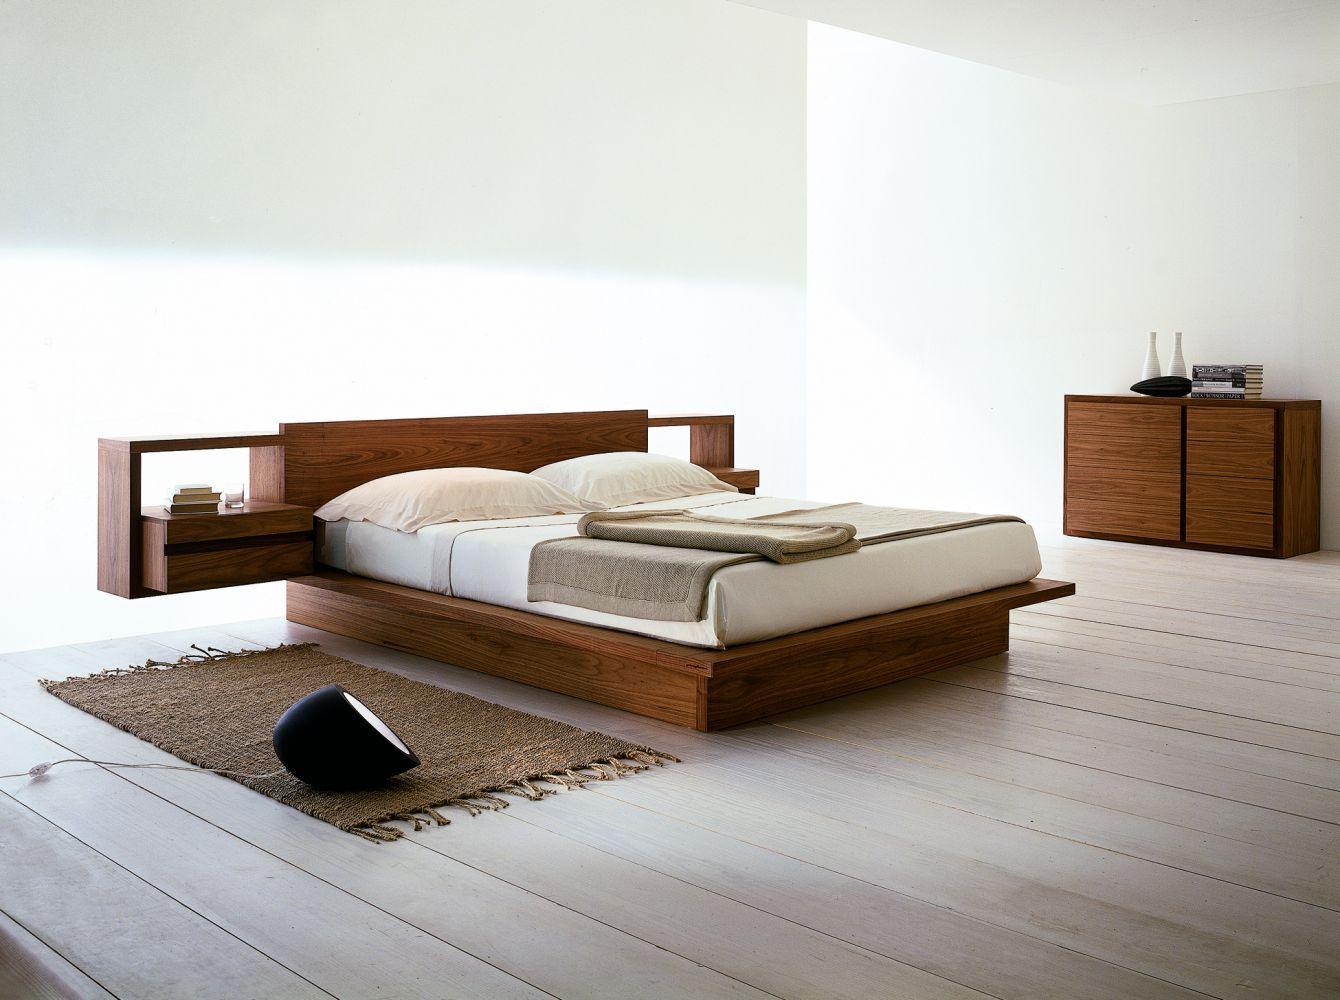 riva 1920 | | legno | natural living | kauri | briccole | moebel, Schlafzimmer entwurf